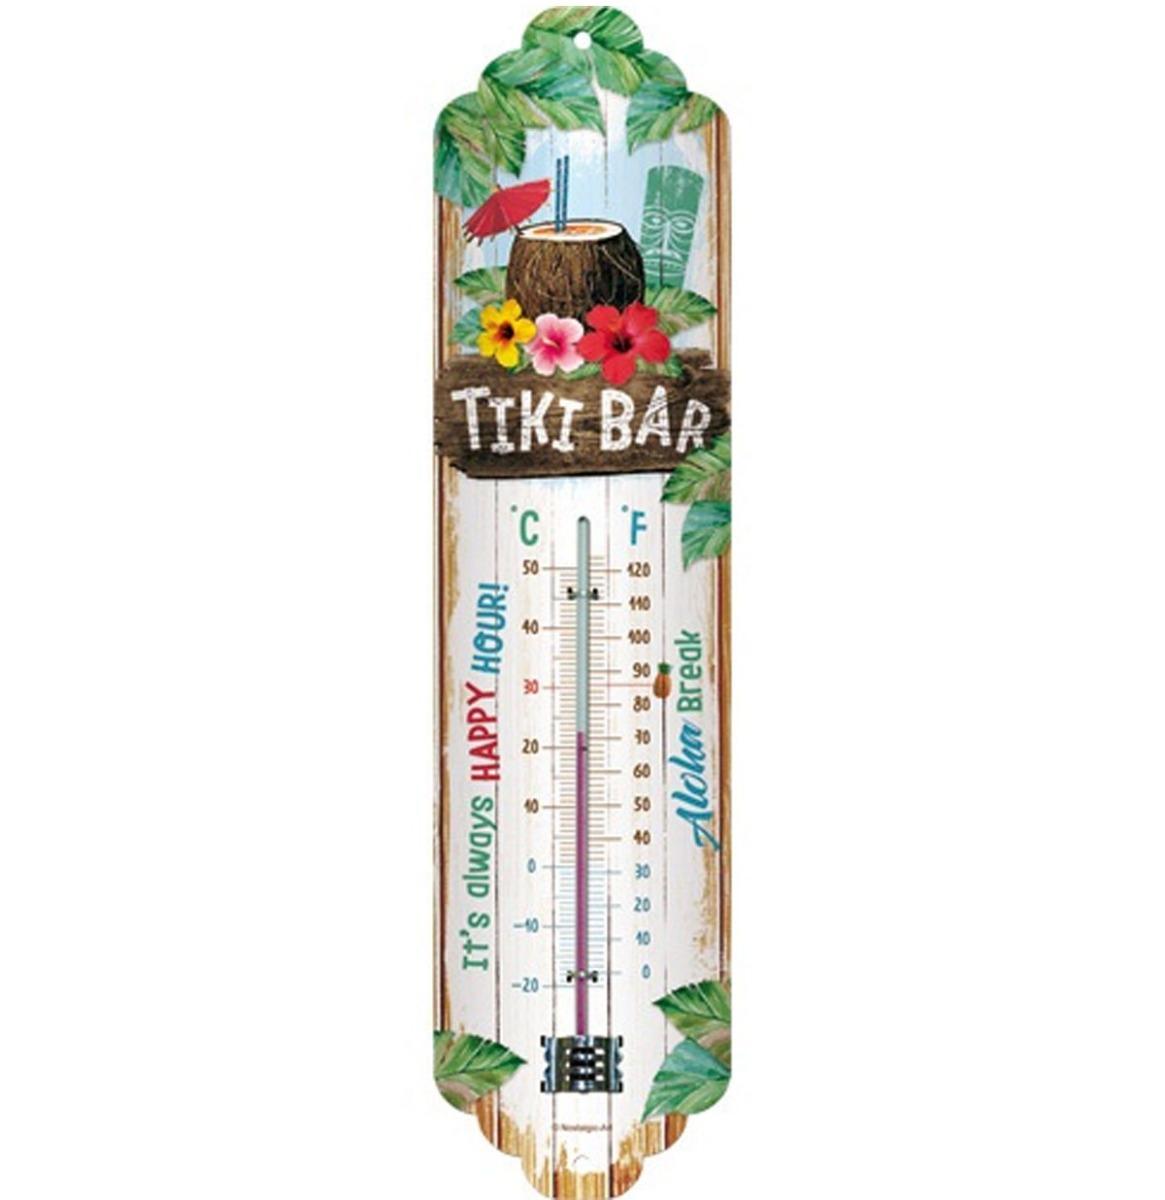 Tiki Bar Thermometer